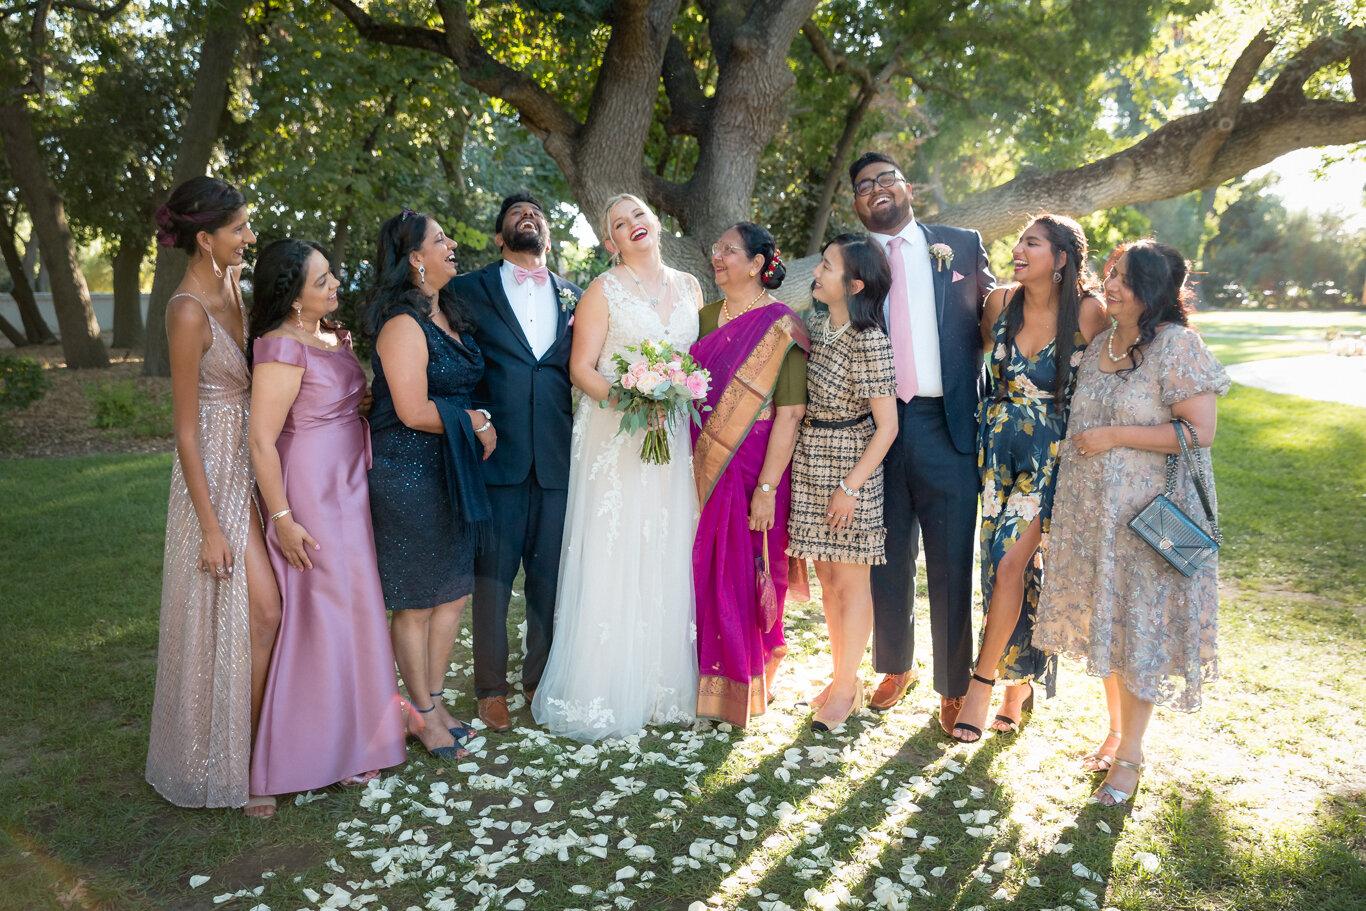 2019.08.24_Emily-Ashir-Wedding-at-the-Maples-5975.jpg